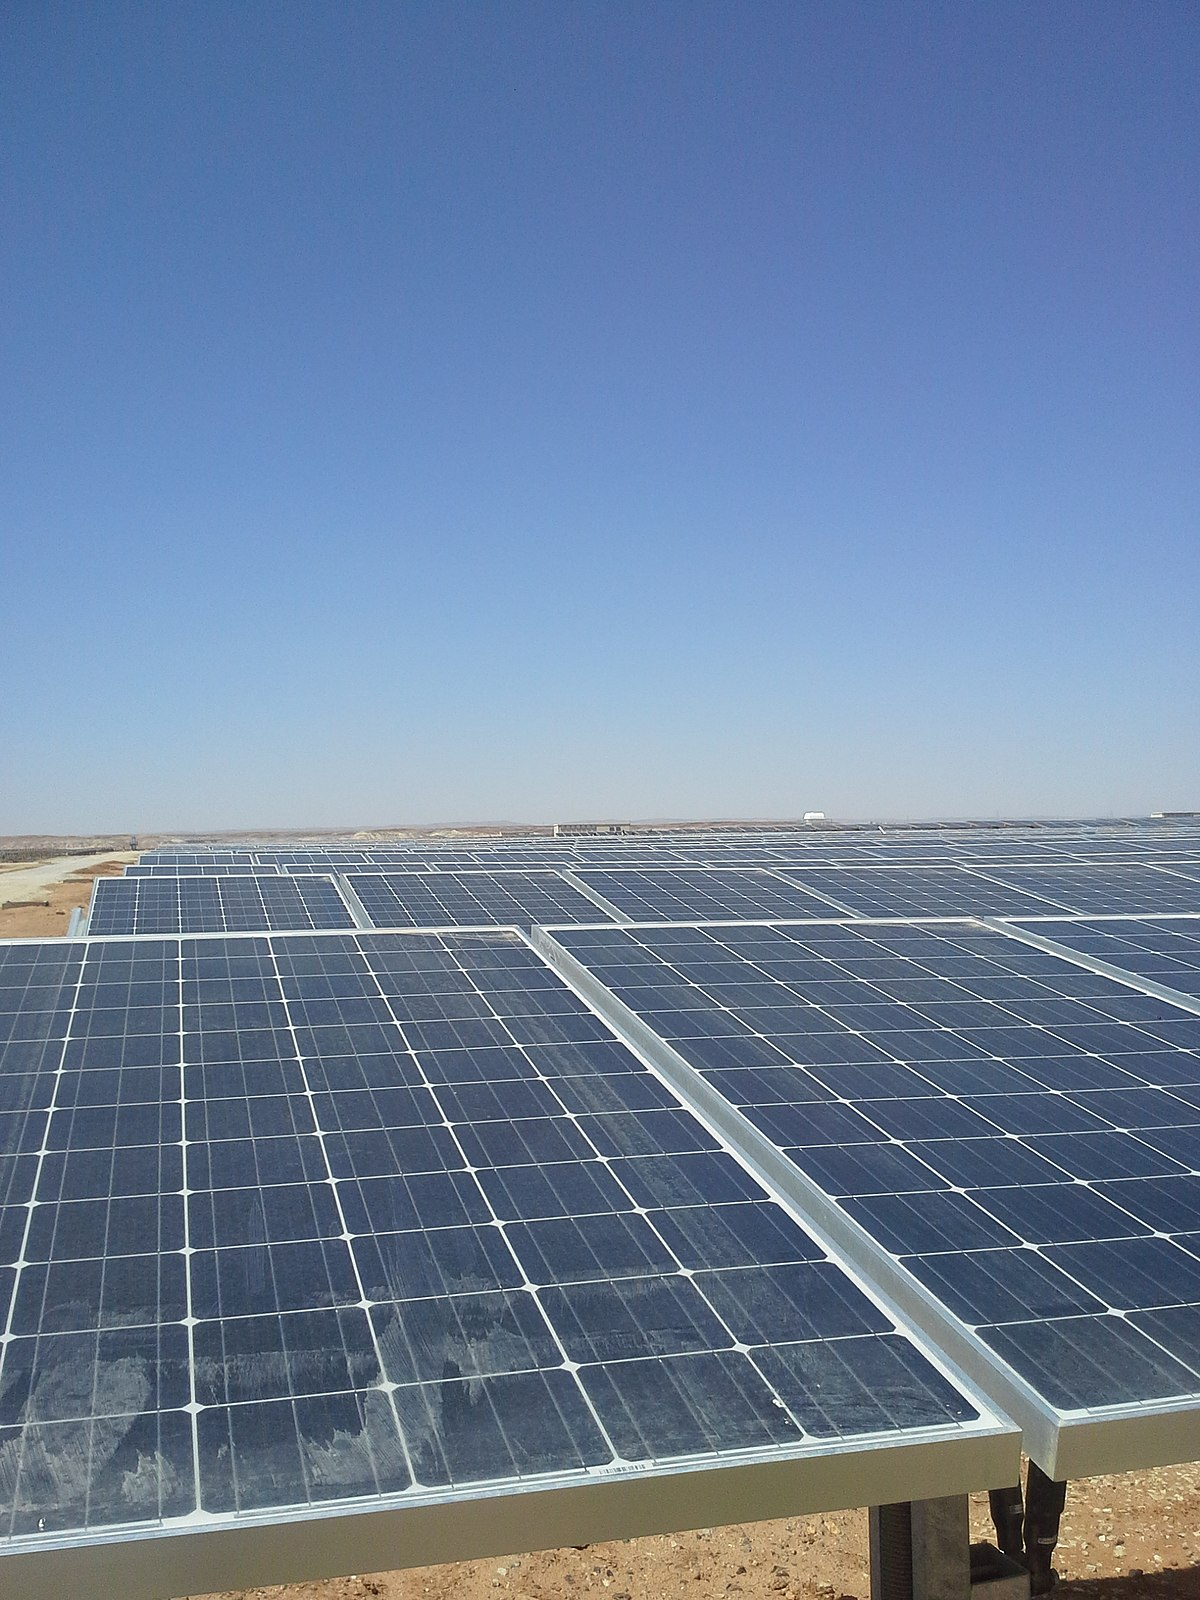 Shams Ma'an Solar Power Plant - Wikipedia